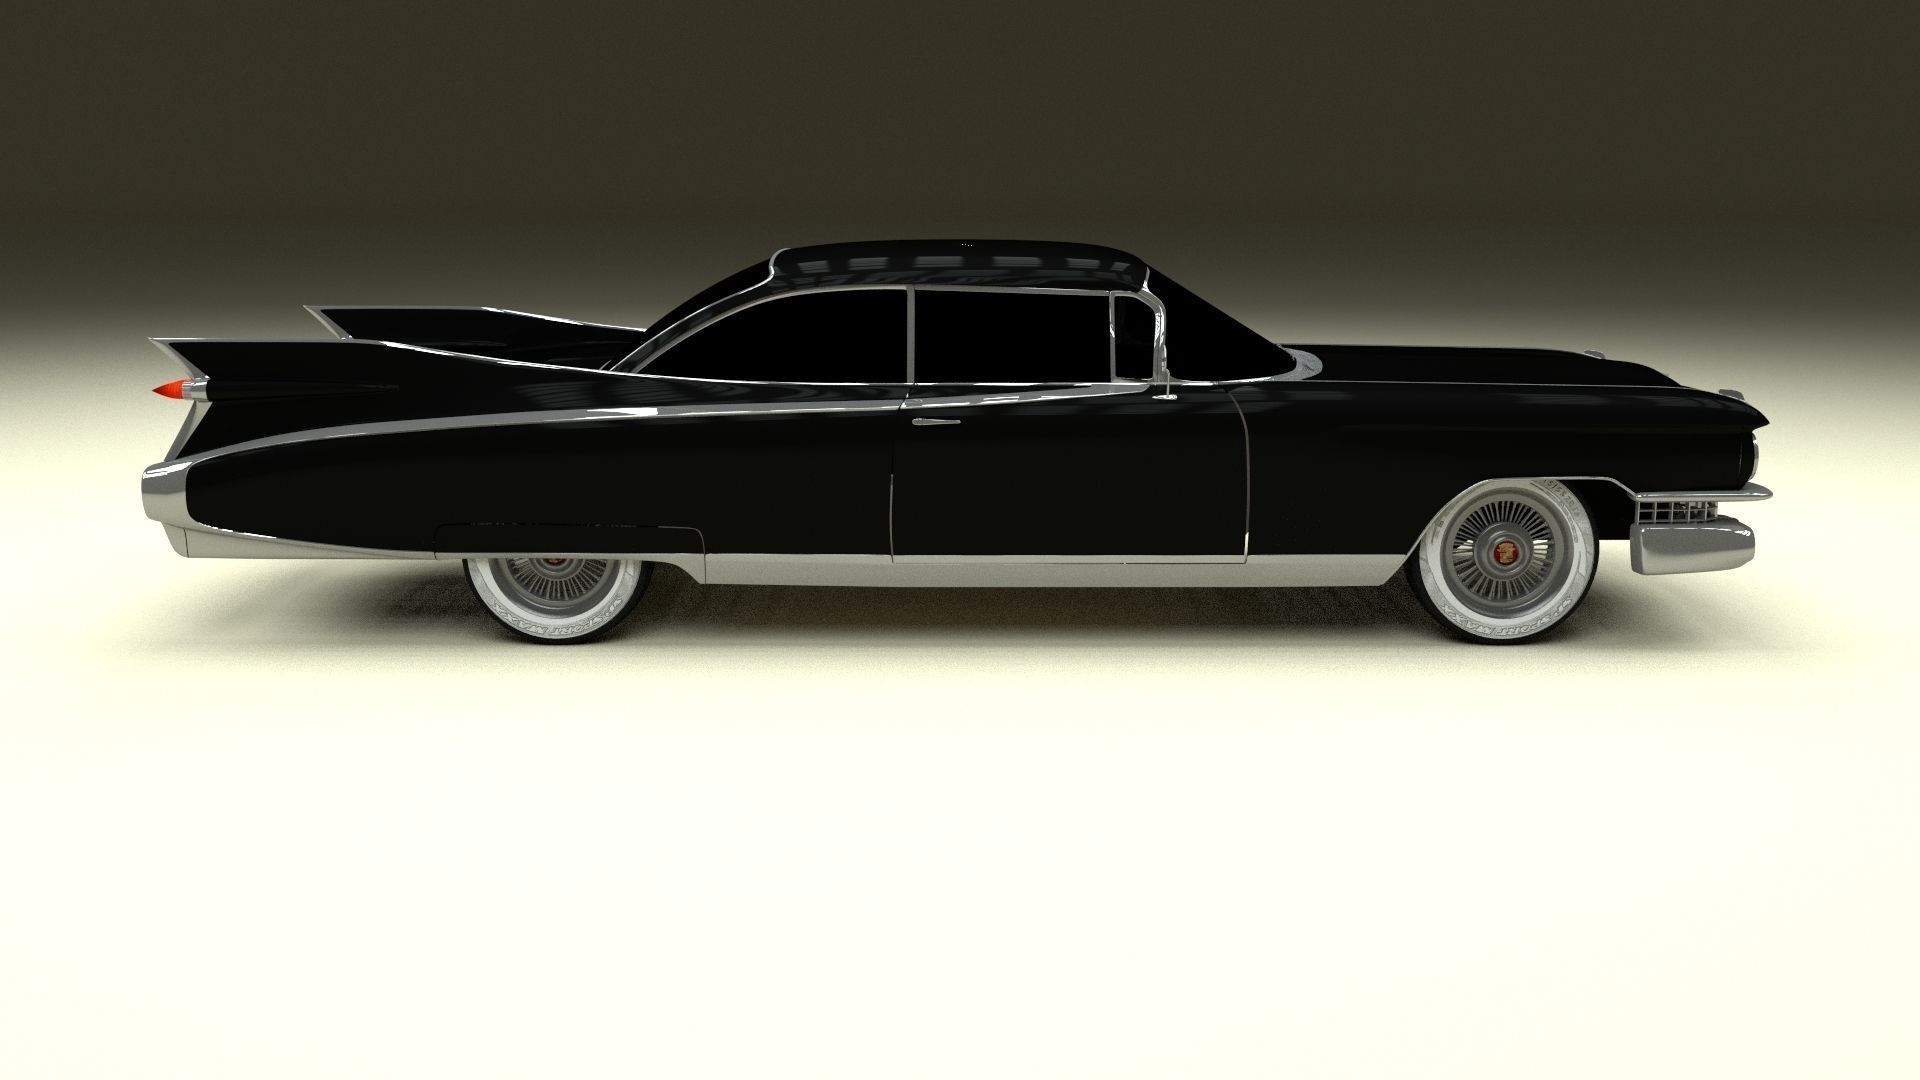 3d Model 1959 Cadillac Eldorado 62 Series Coupe Vr Ar